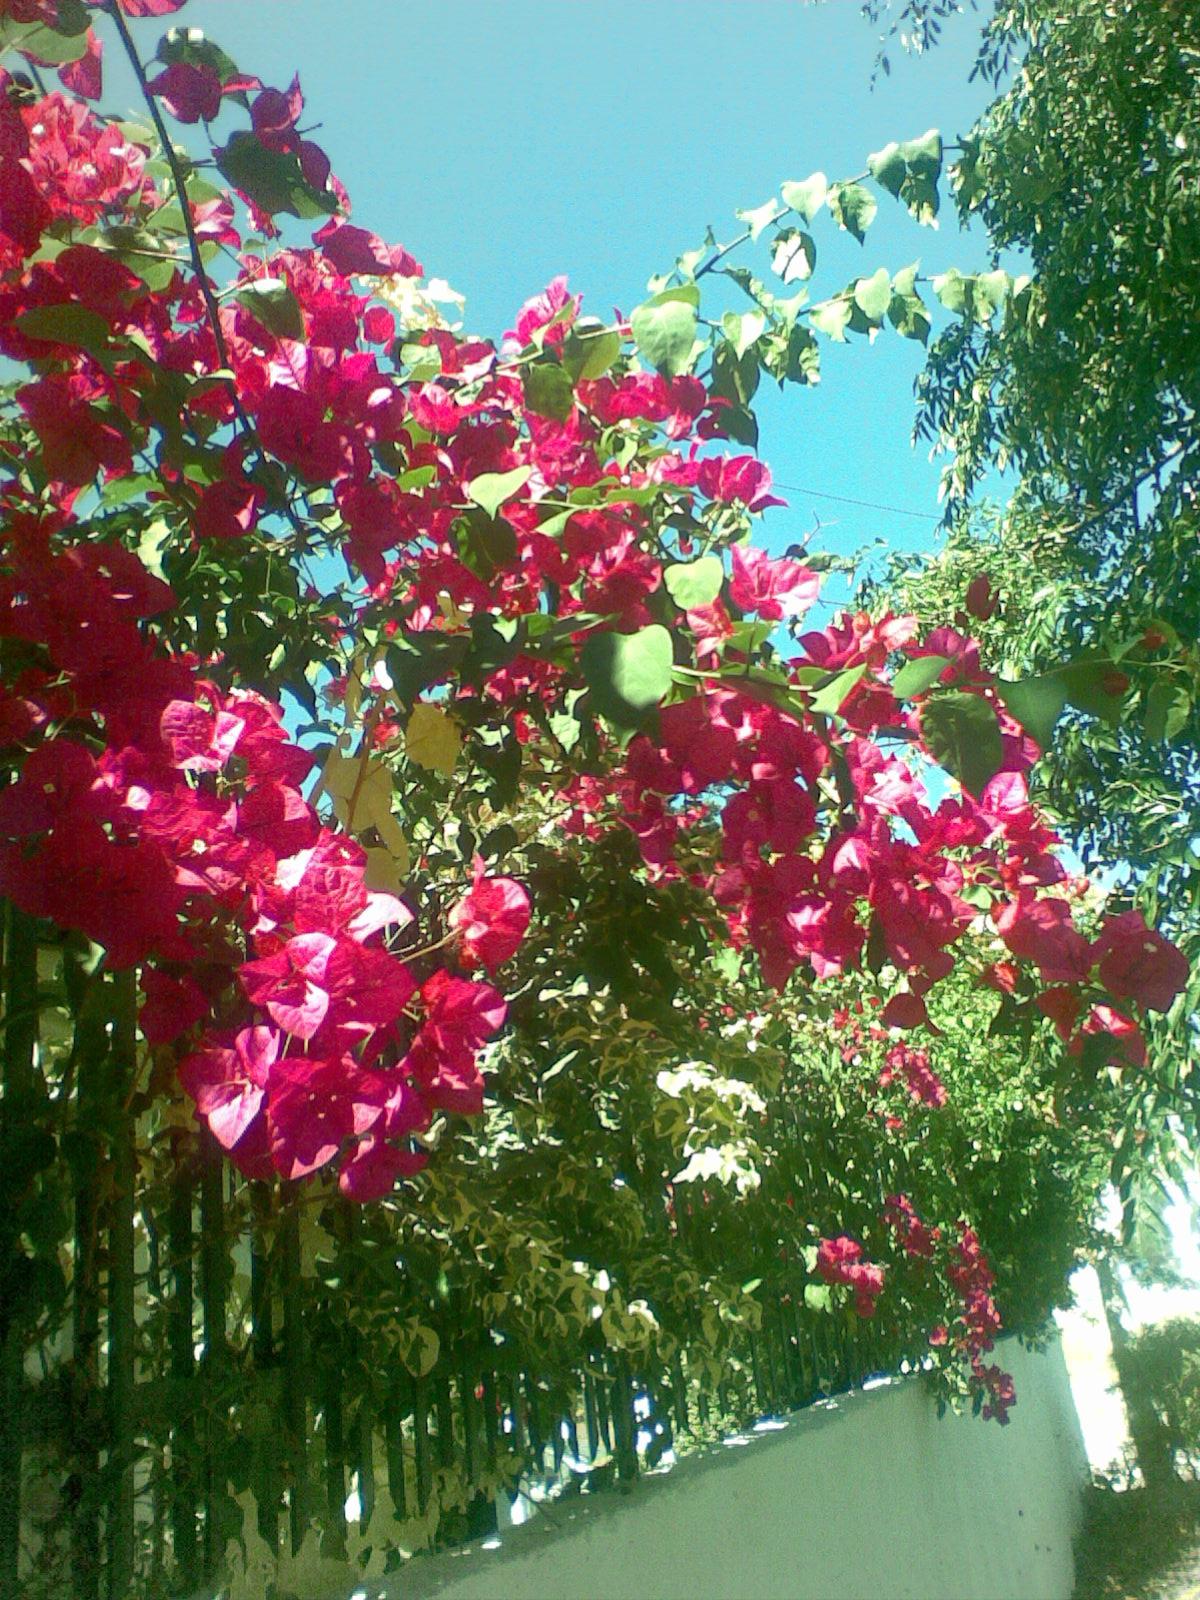 Olvidando caminos flores de verano tard o - Flores de verano ...